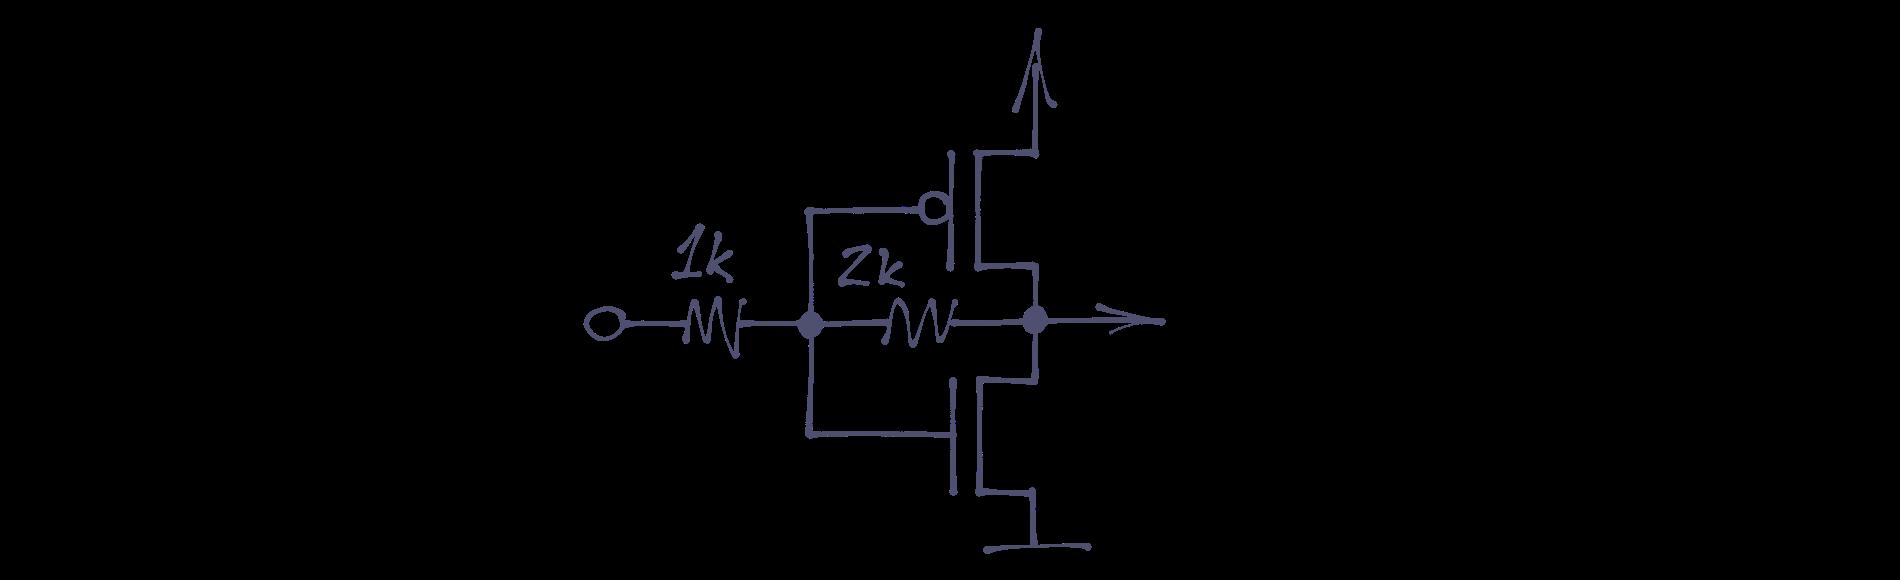 components_simple-schmitt.png